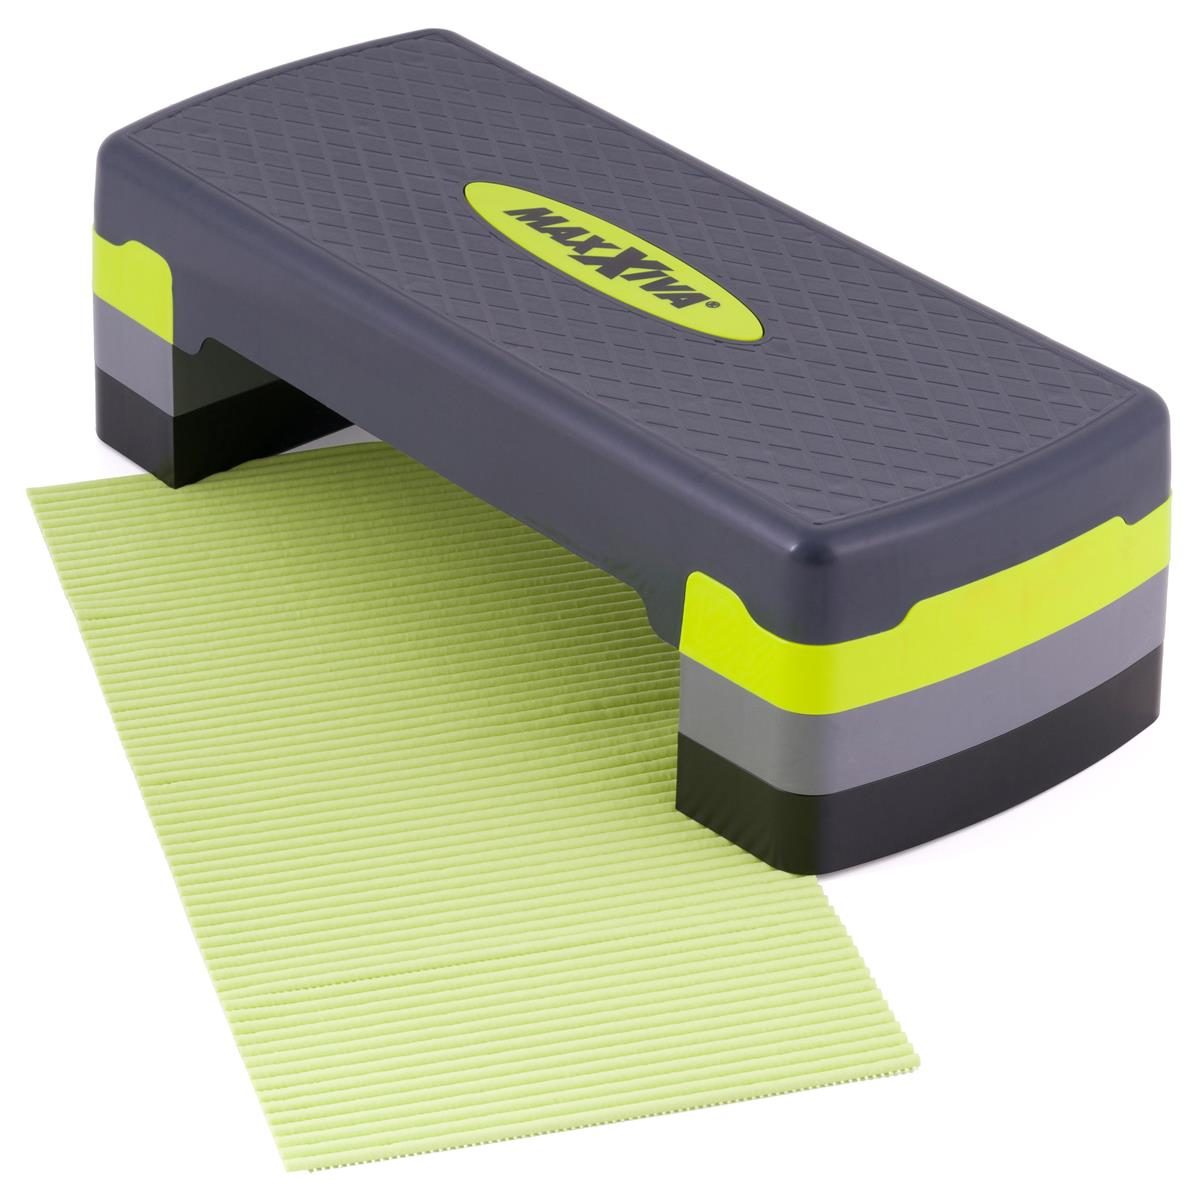 MAXXIVA Stepper Aerobic Fitness Steppbrett Antirutsch-Matte höhenverstellbar